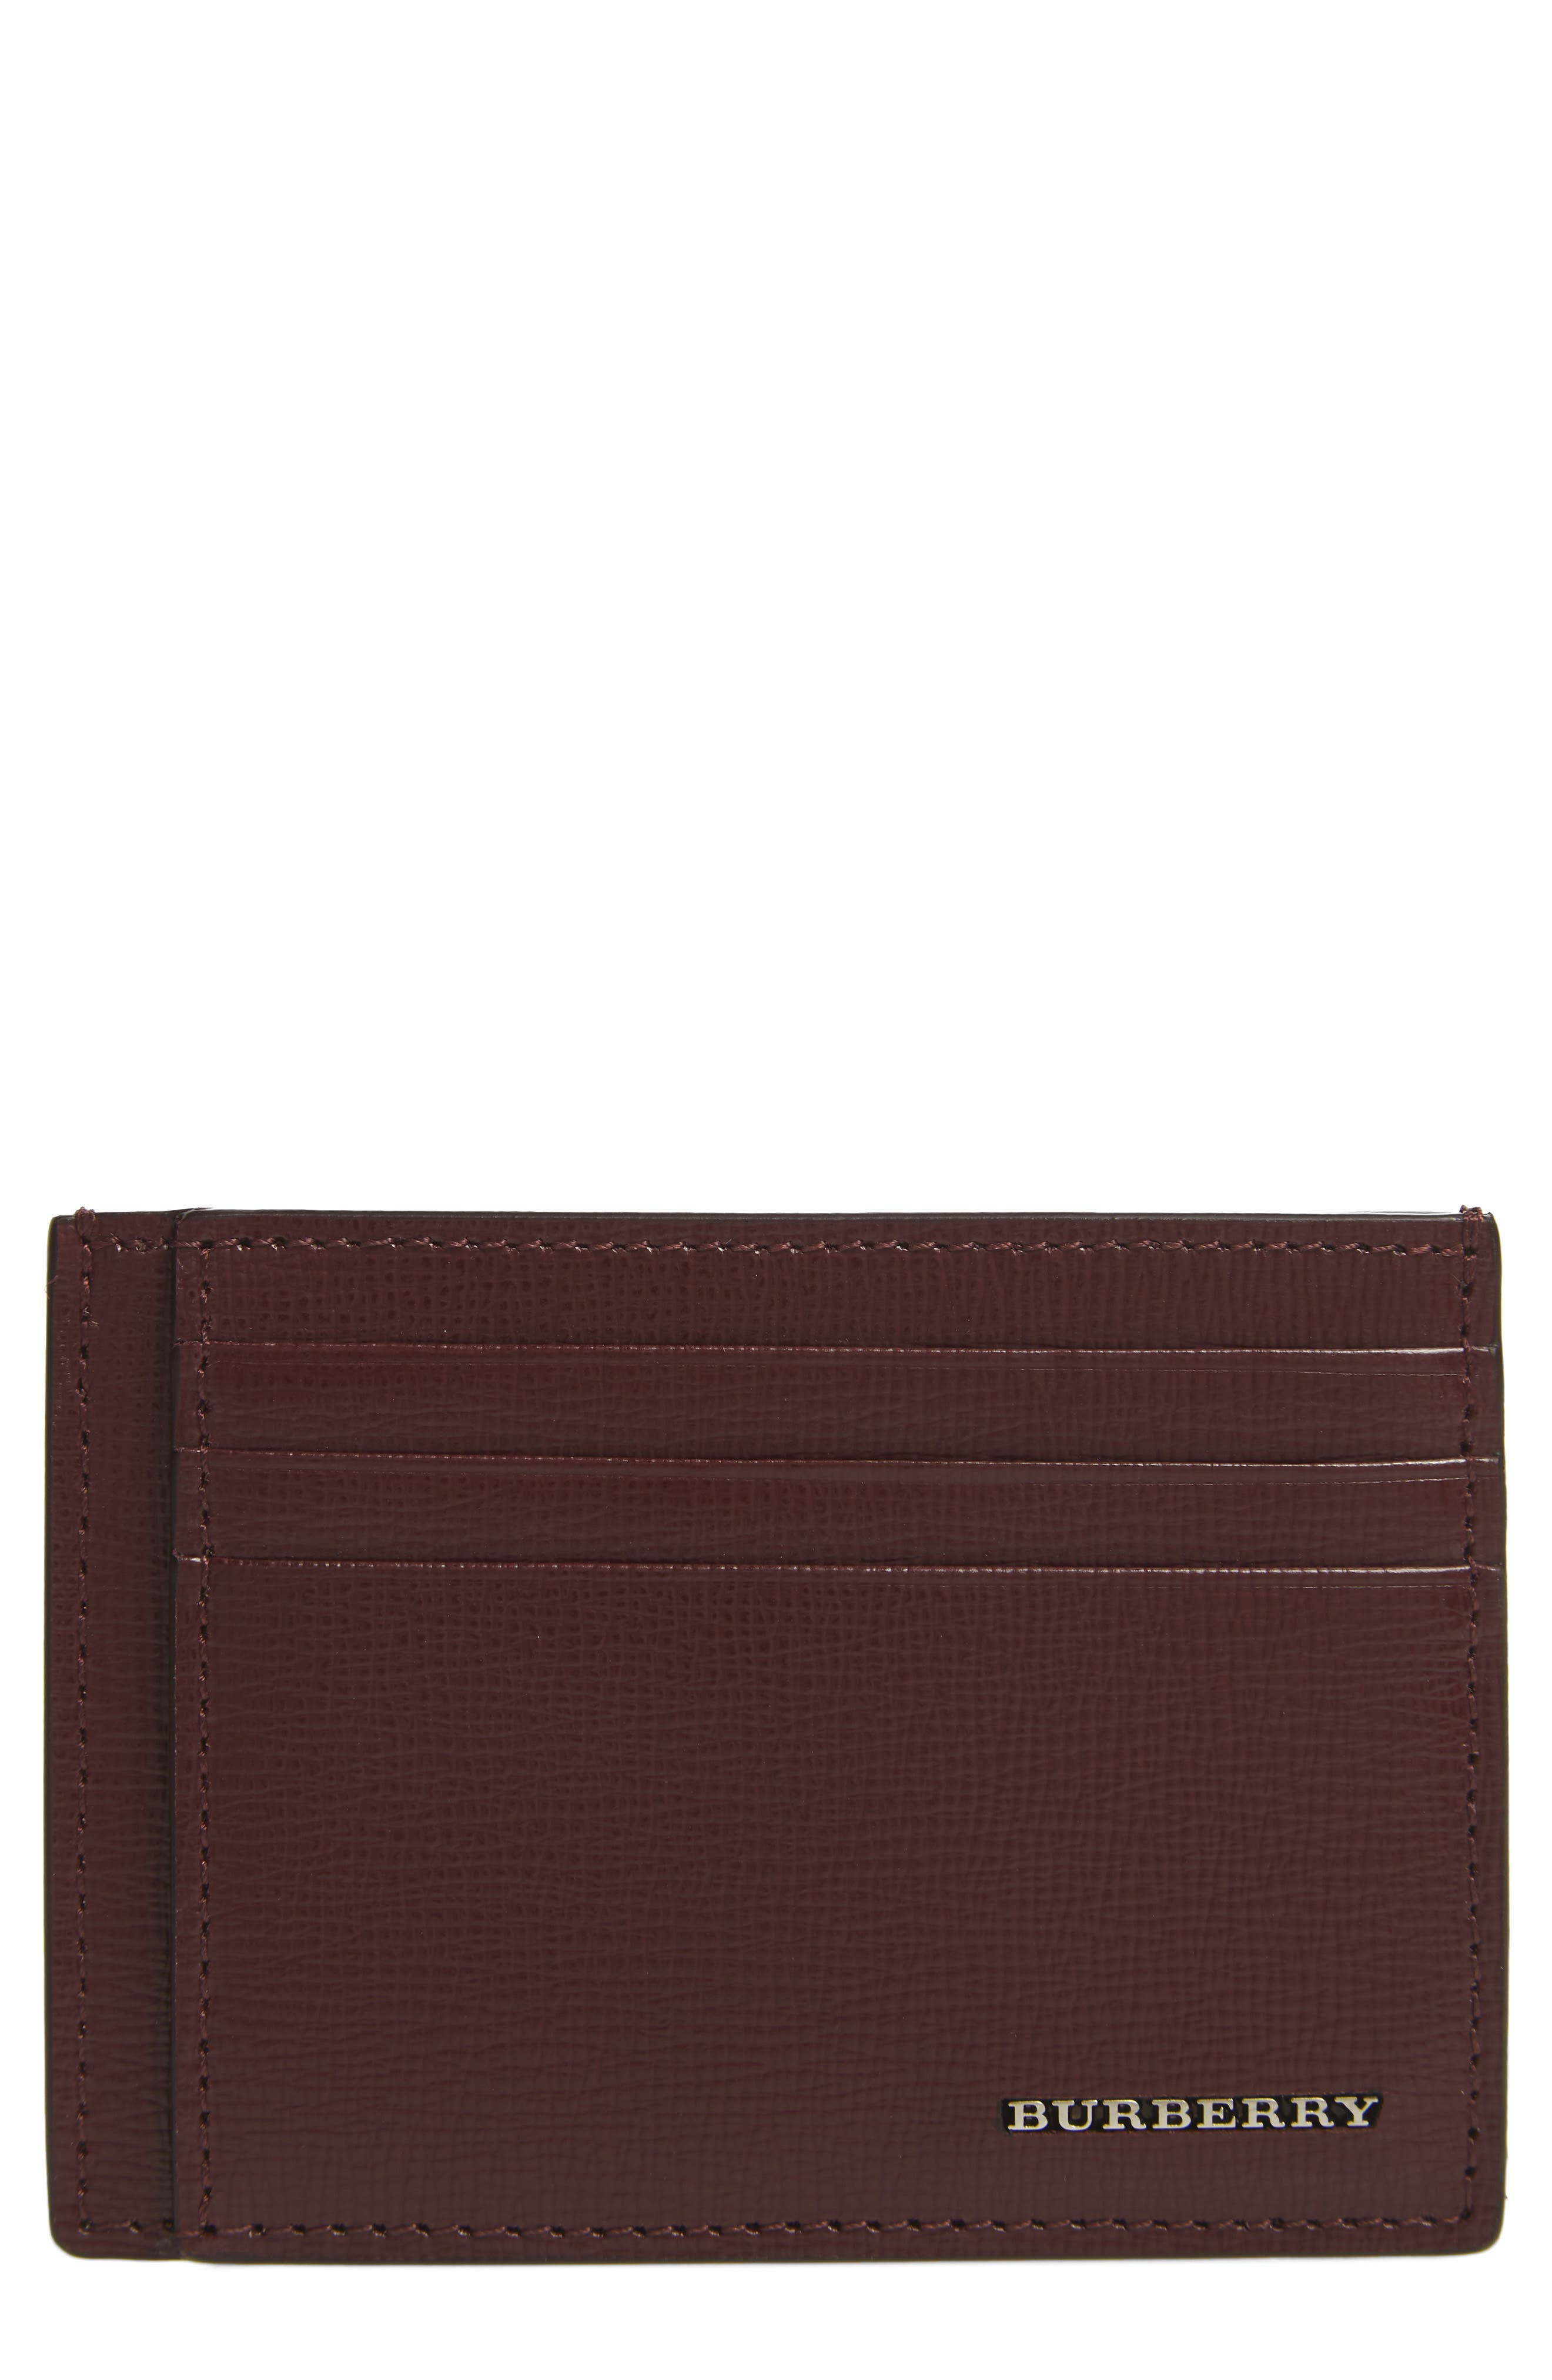 Bernie Check Card Case,                         Main,                         color, 935